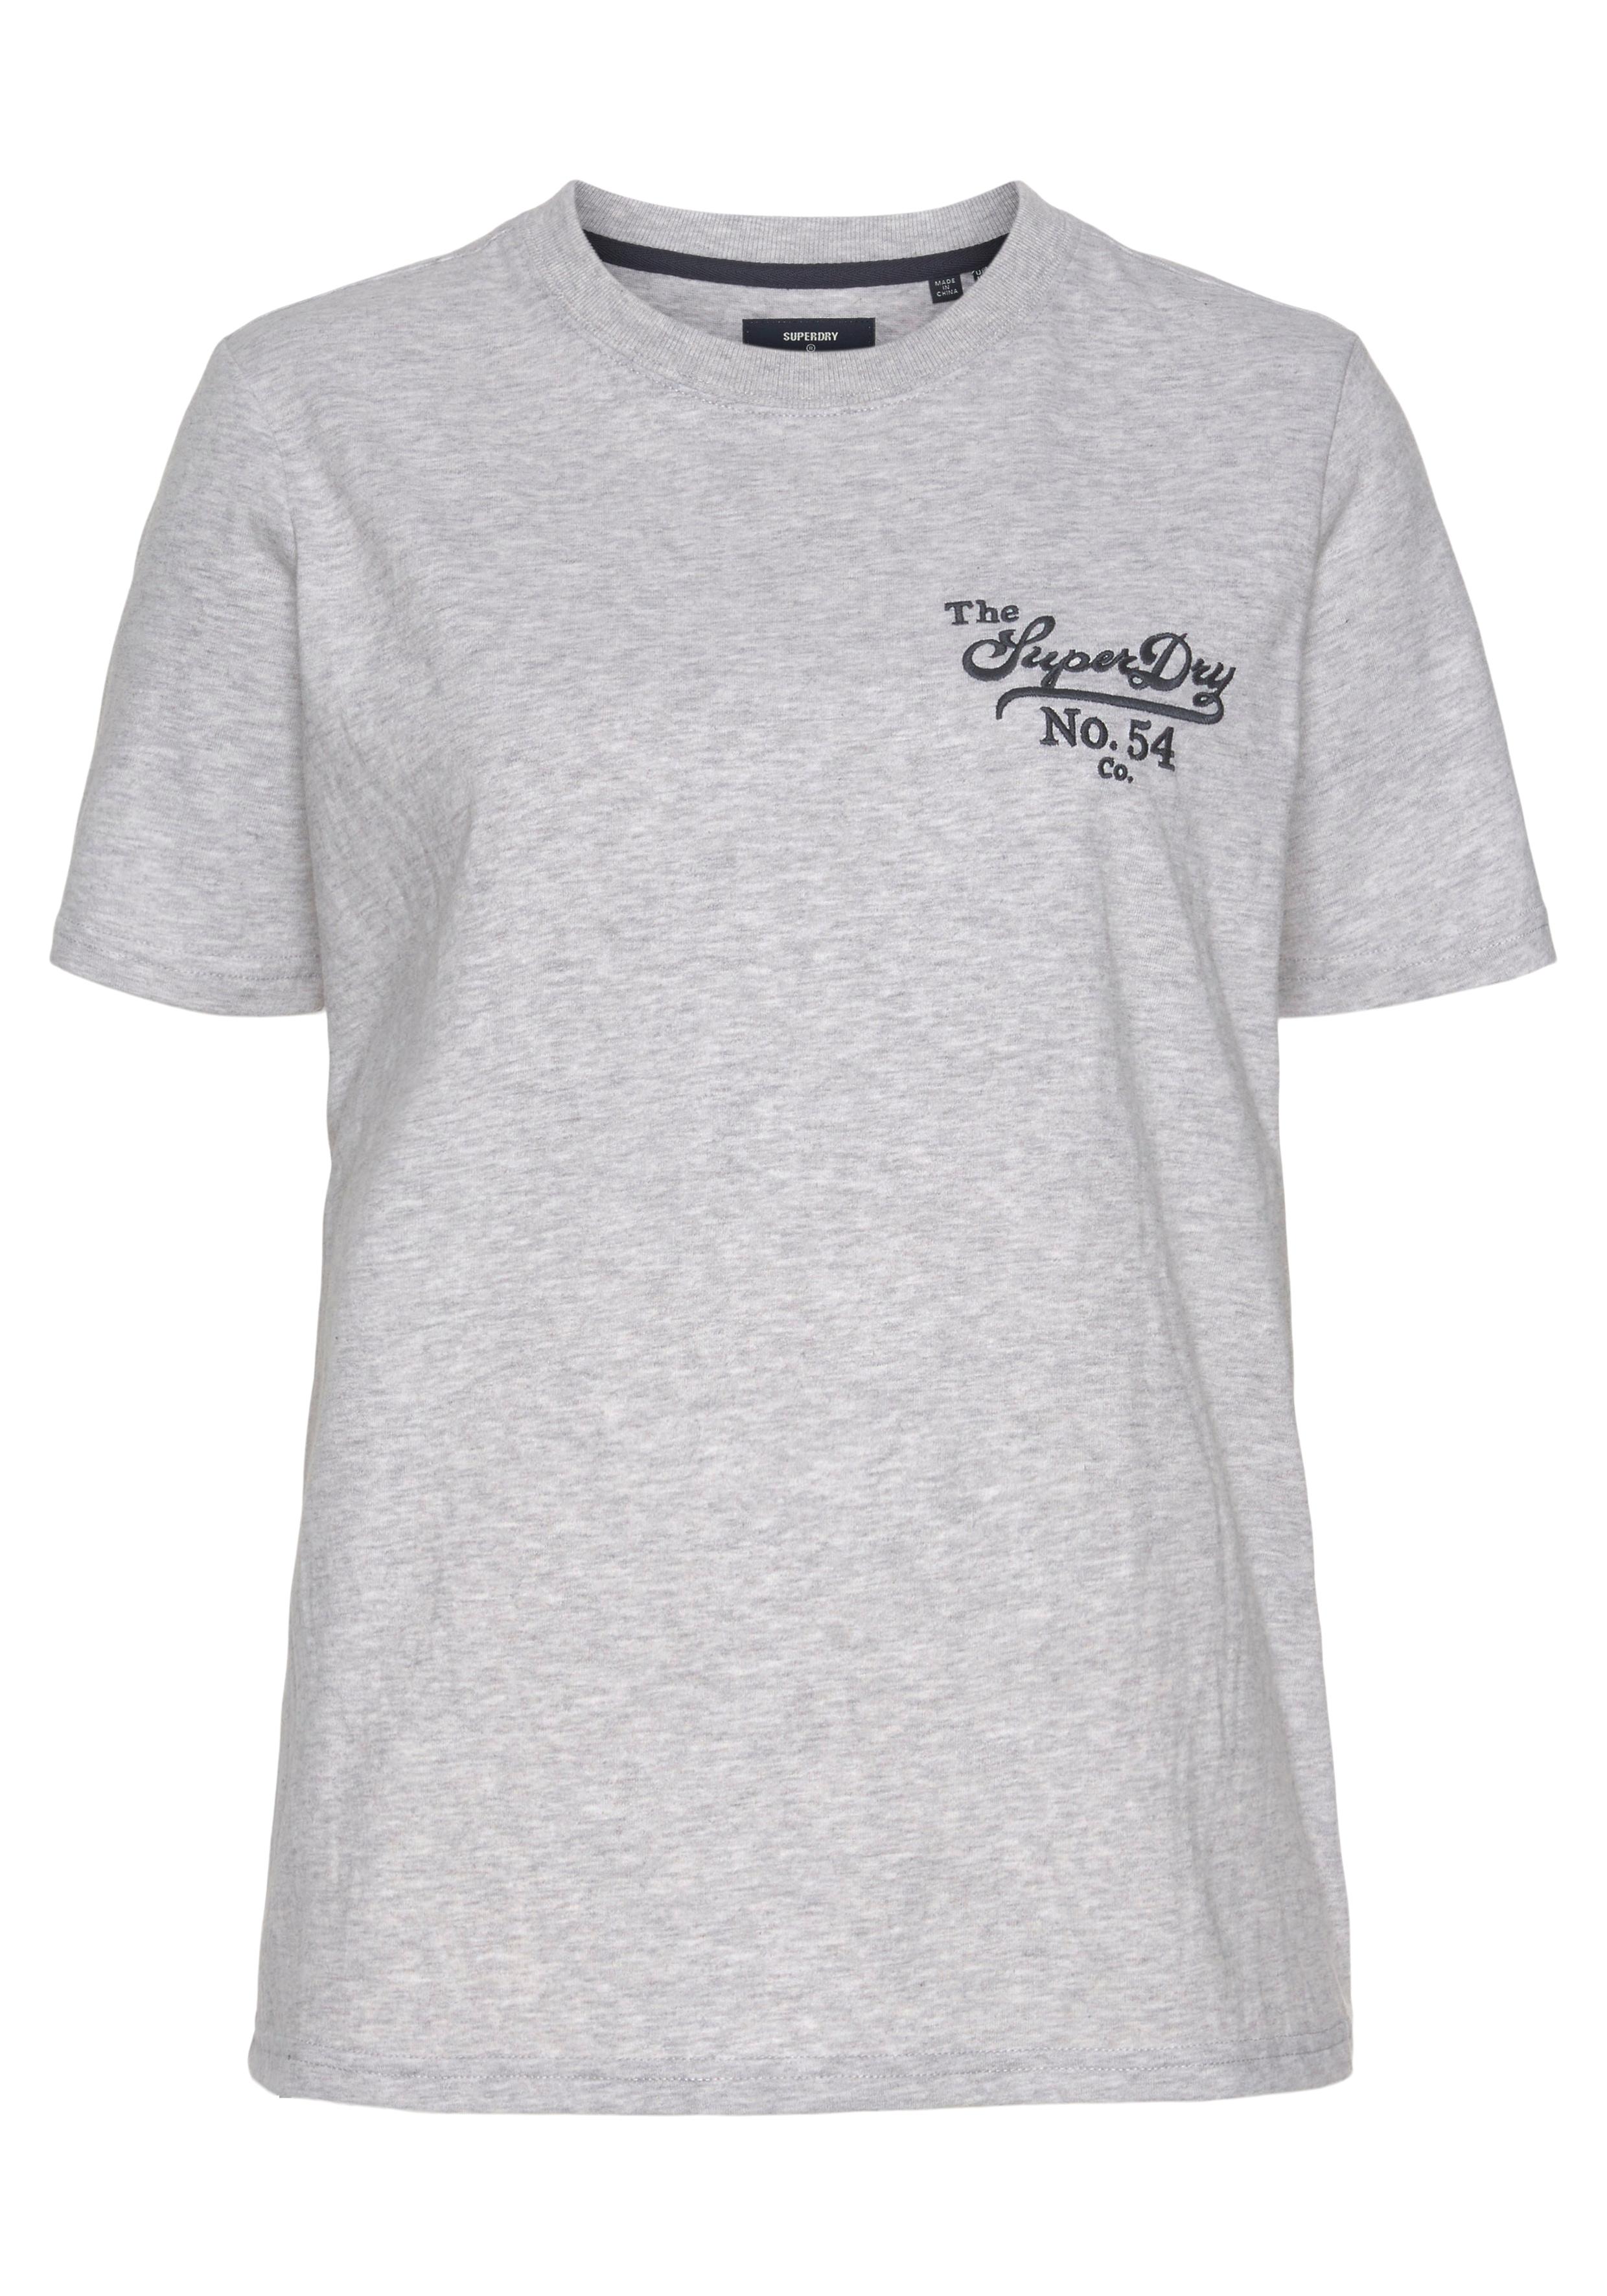 superdry -  T-Shirt, mit großem Logodruck